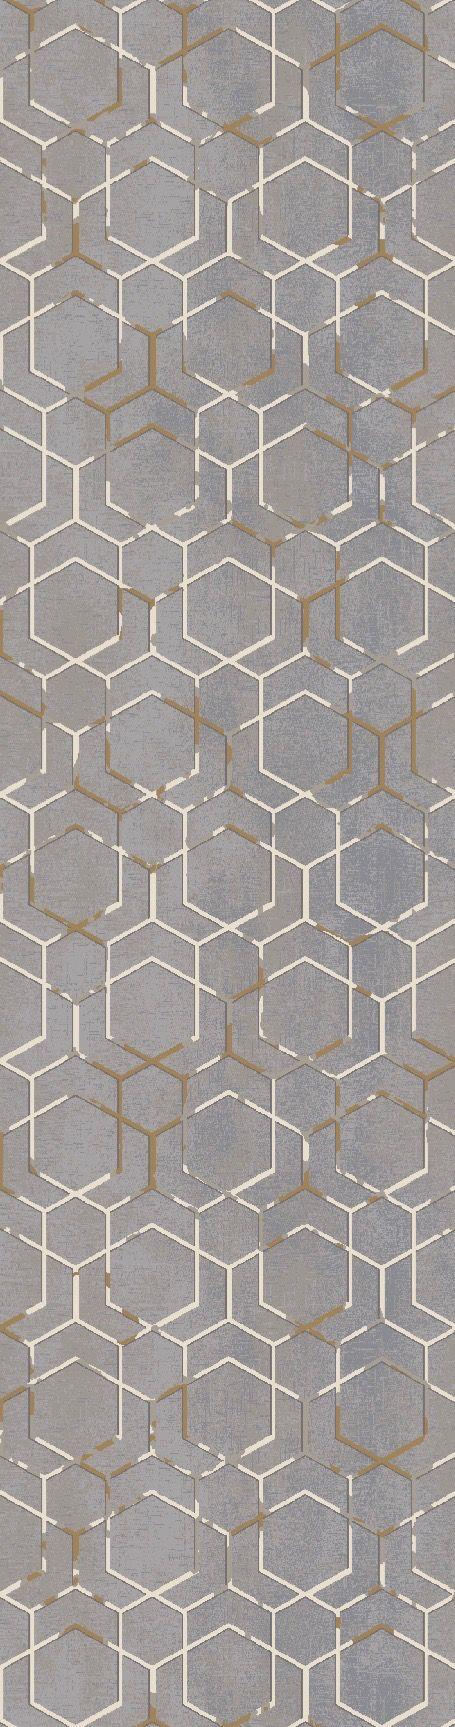 Nx Ex13328 23 Floored Again Textured Carpet